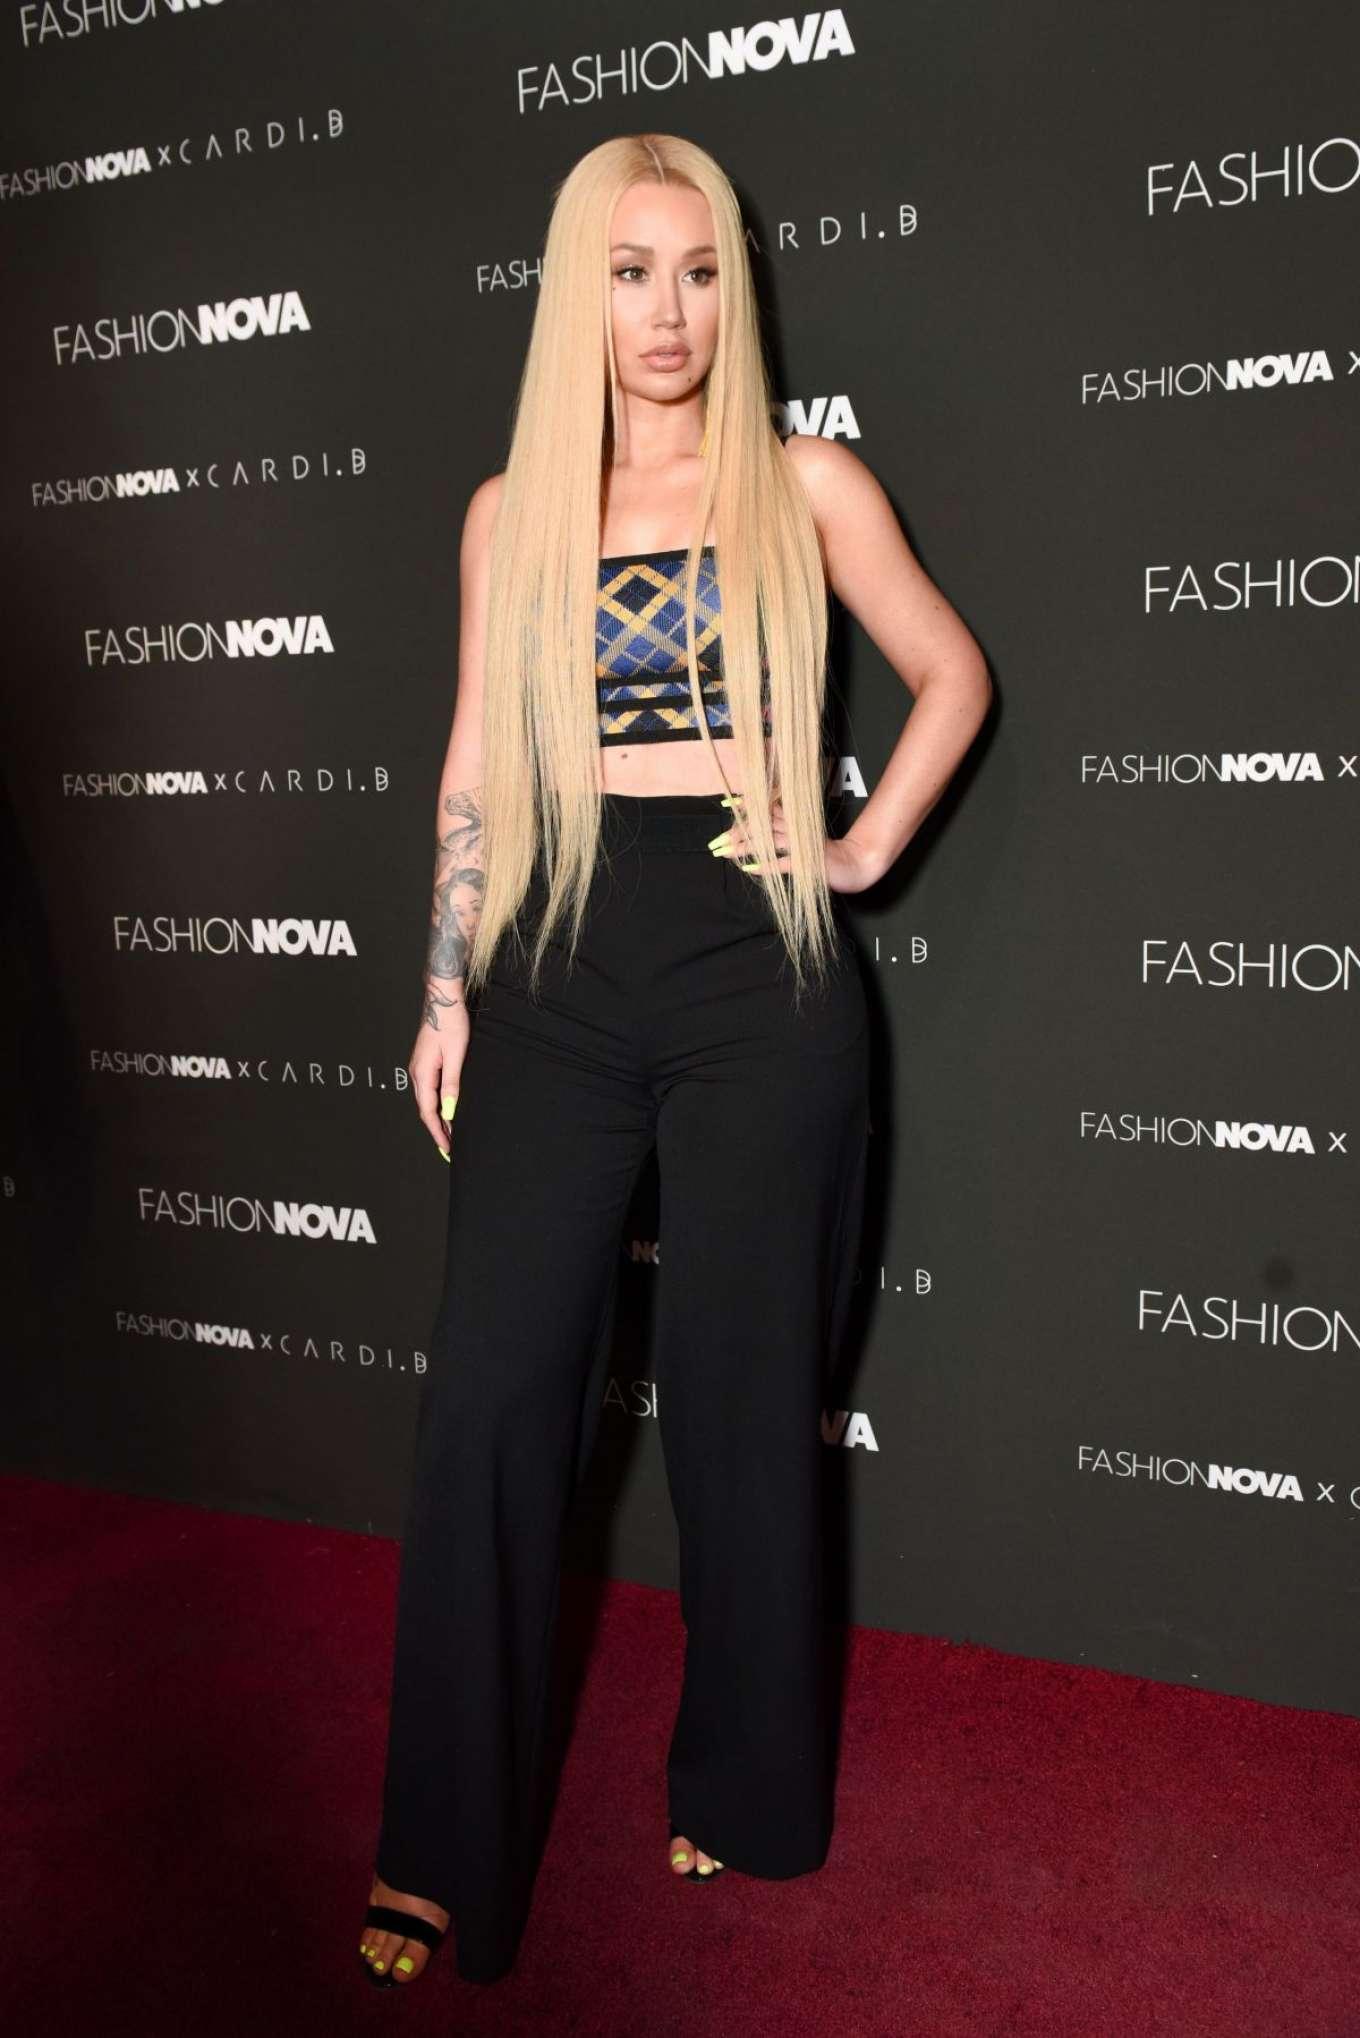 Iggy Azalea 2018 : Iggy Azalea: Fashion Nova x Cardi B Event -04